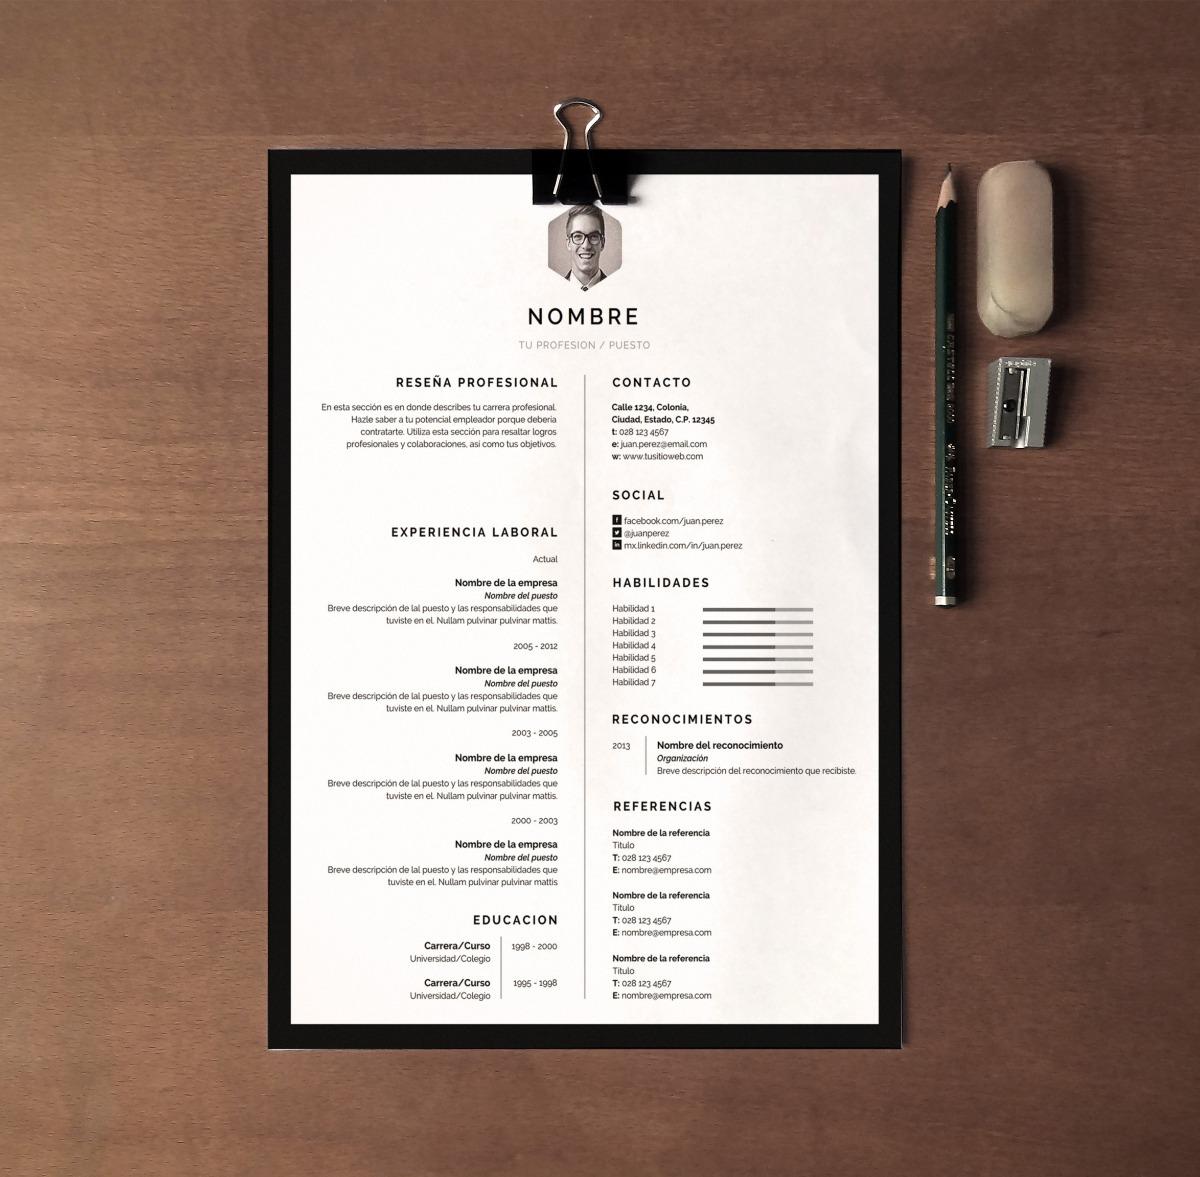 Curriculum Vitae Cv Diseño Profesional Marco - Word Docx - $ 49.00 ...